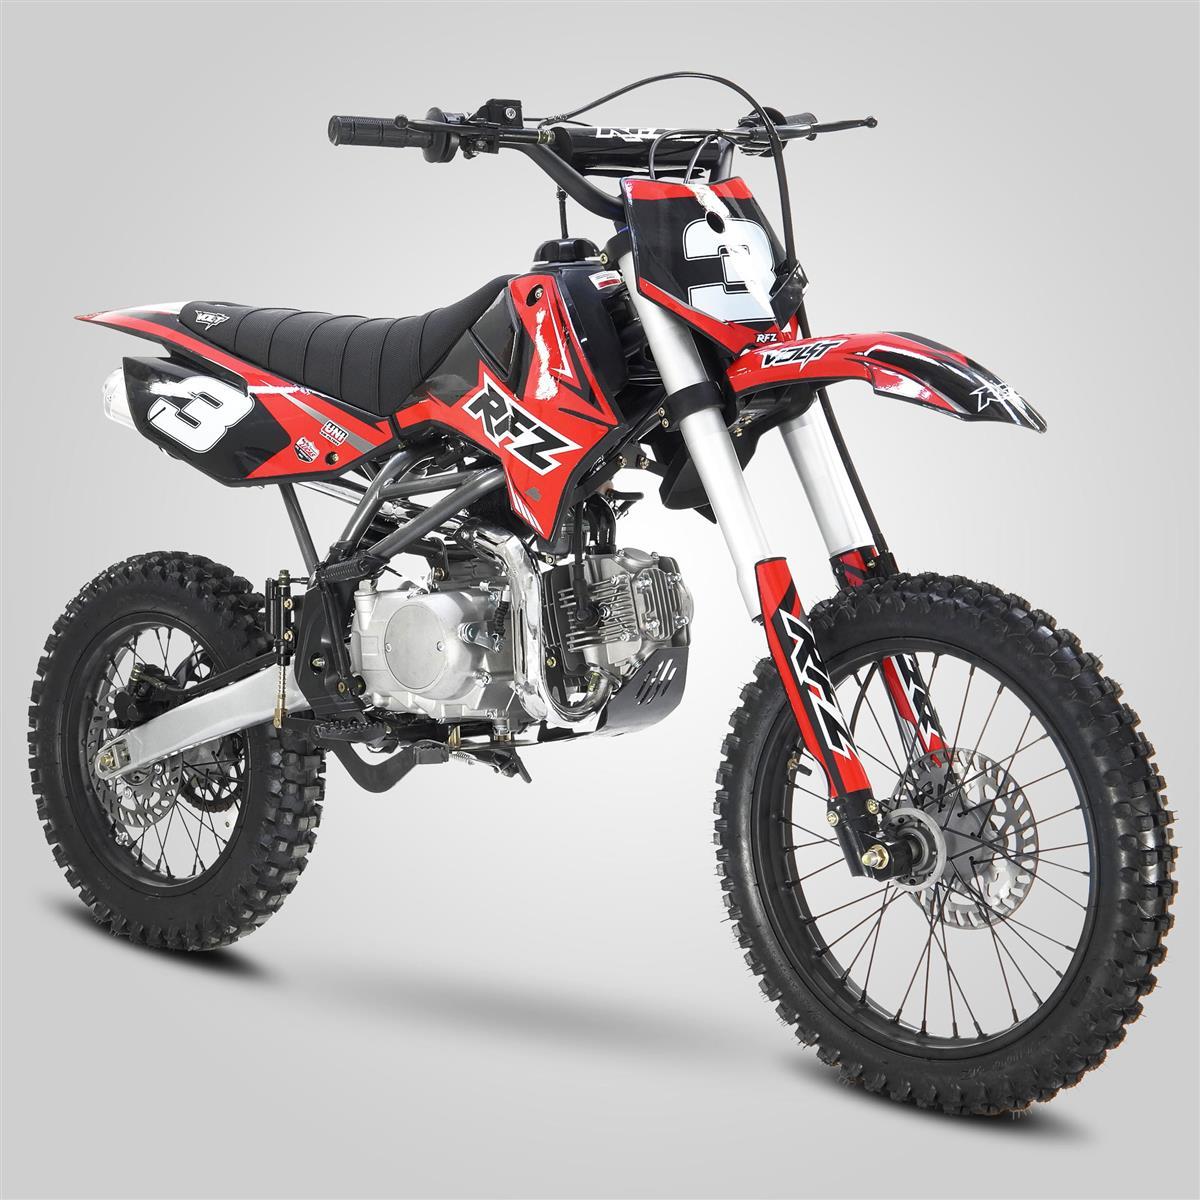 pit bike dirt apollo motors expert 150cc en 14 17 gamme 2019 smallmx dirt bike pit. Black Bedroom Furniture Sets. Home Design Ideas